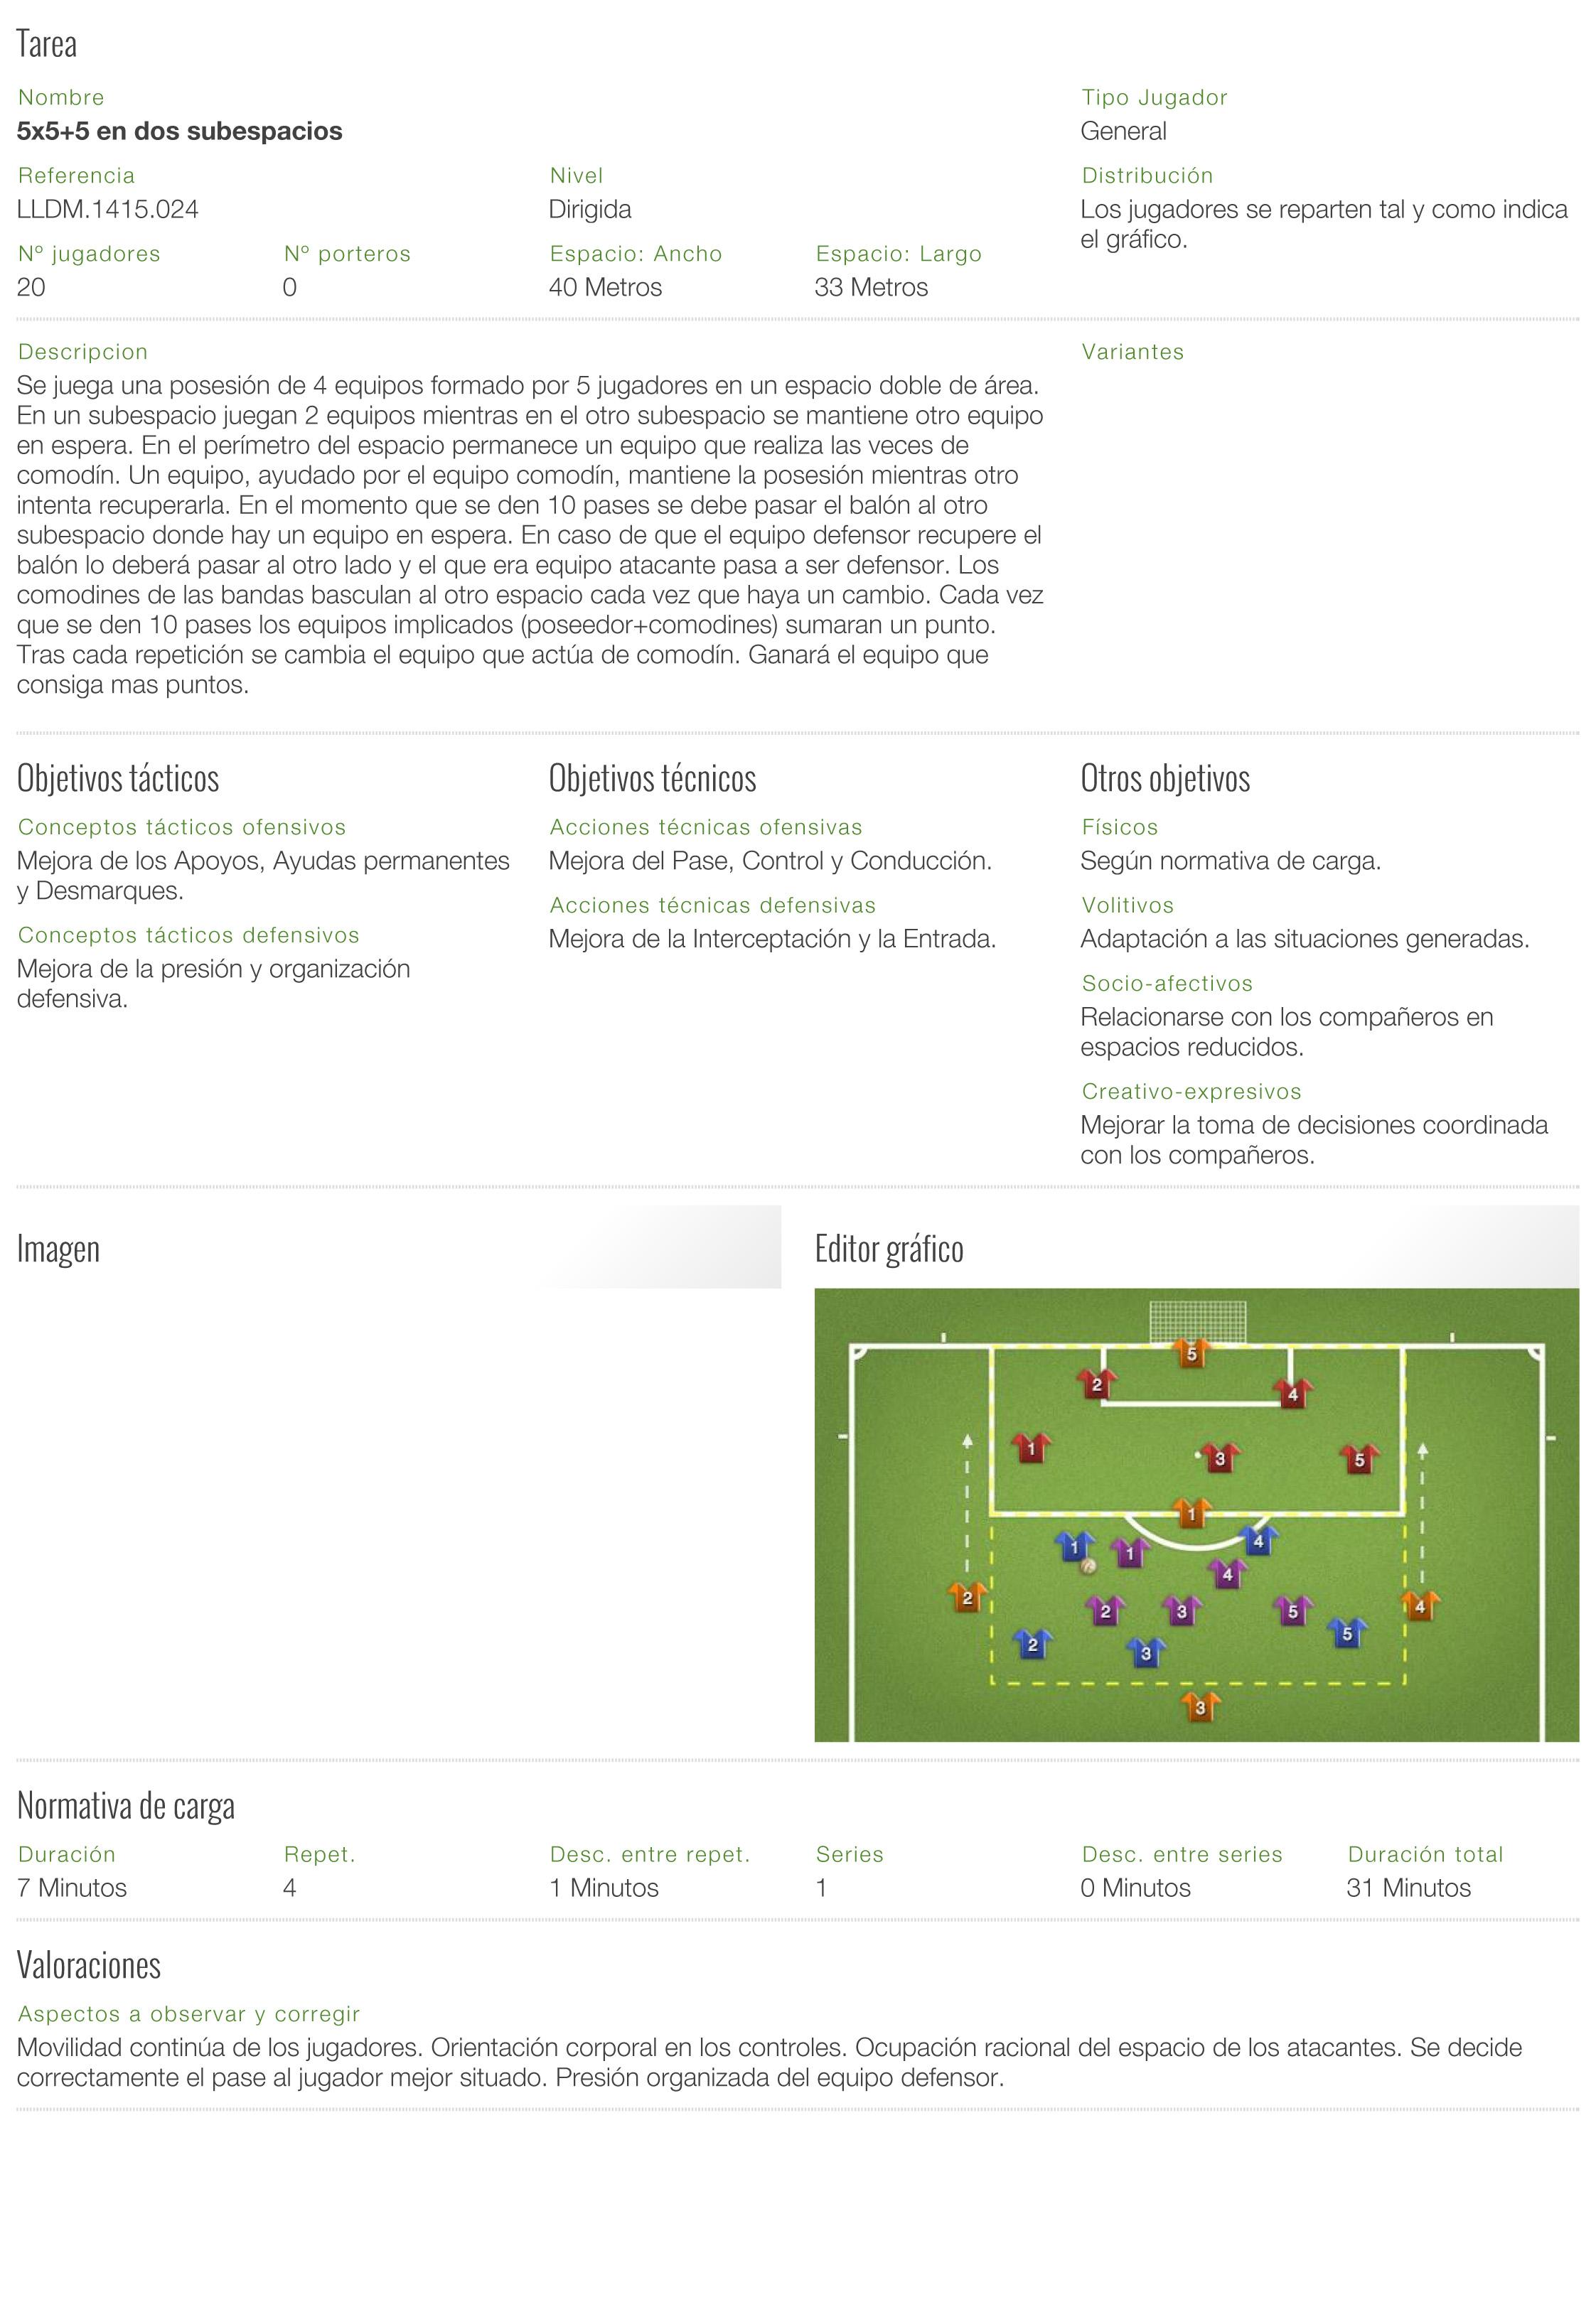 Ejercicio de fútbol- 5x5+5 en dos subespacios